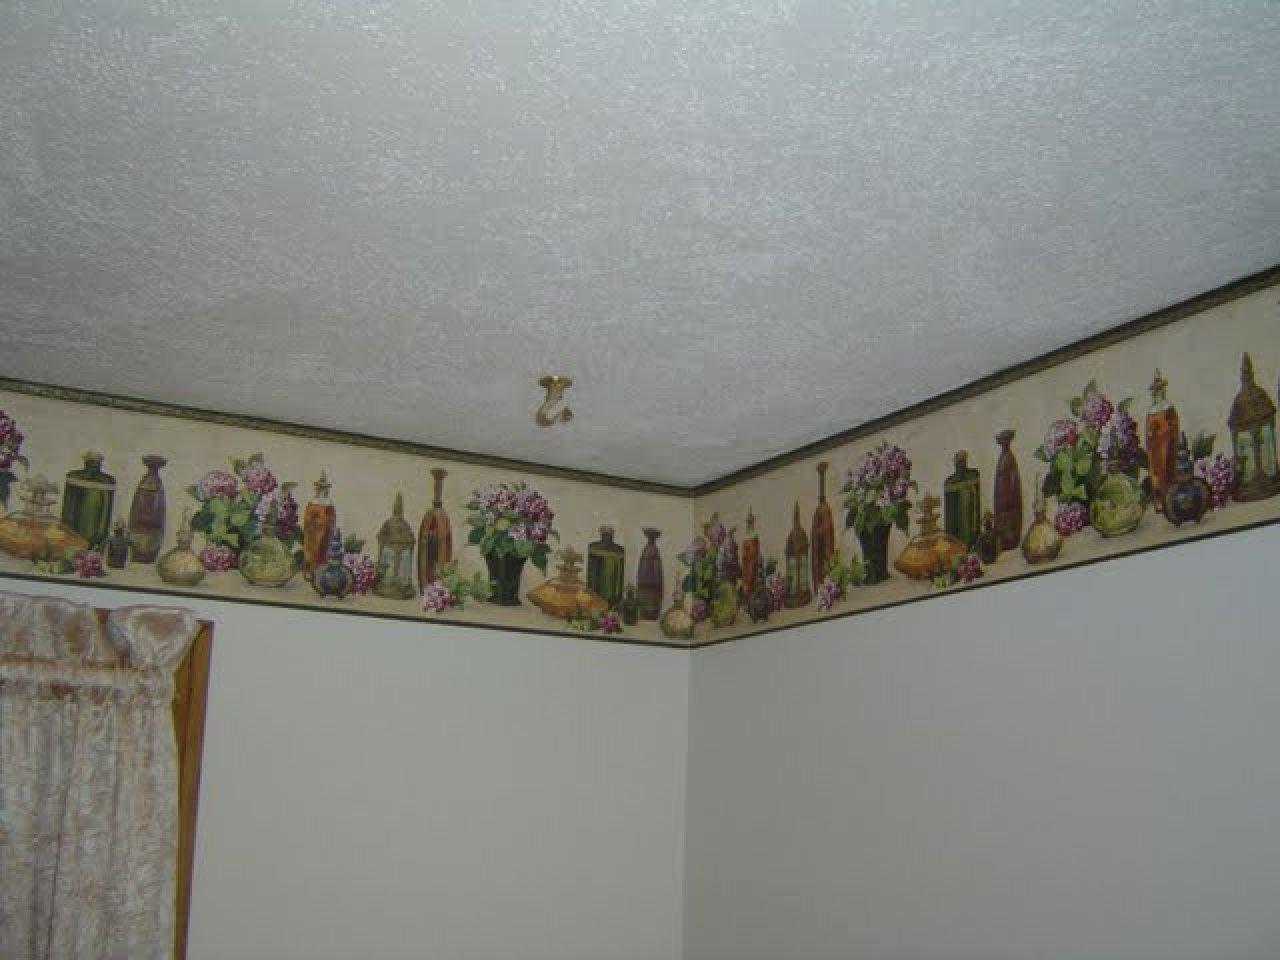 Free Download Wallpaper Borders For Bathrooms Bathroom Design